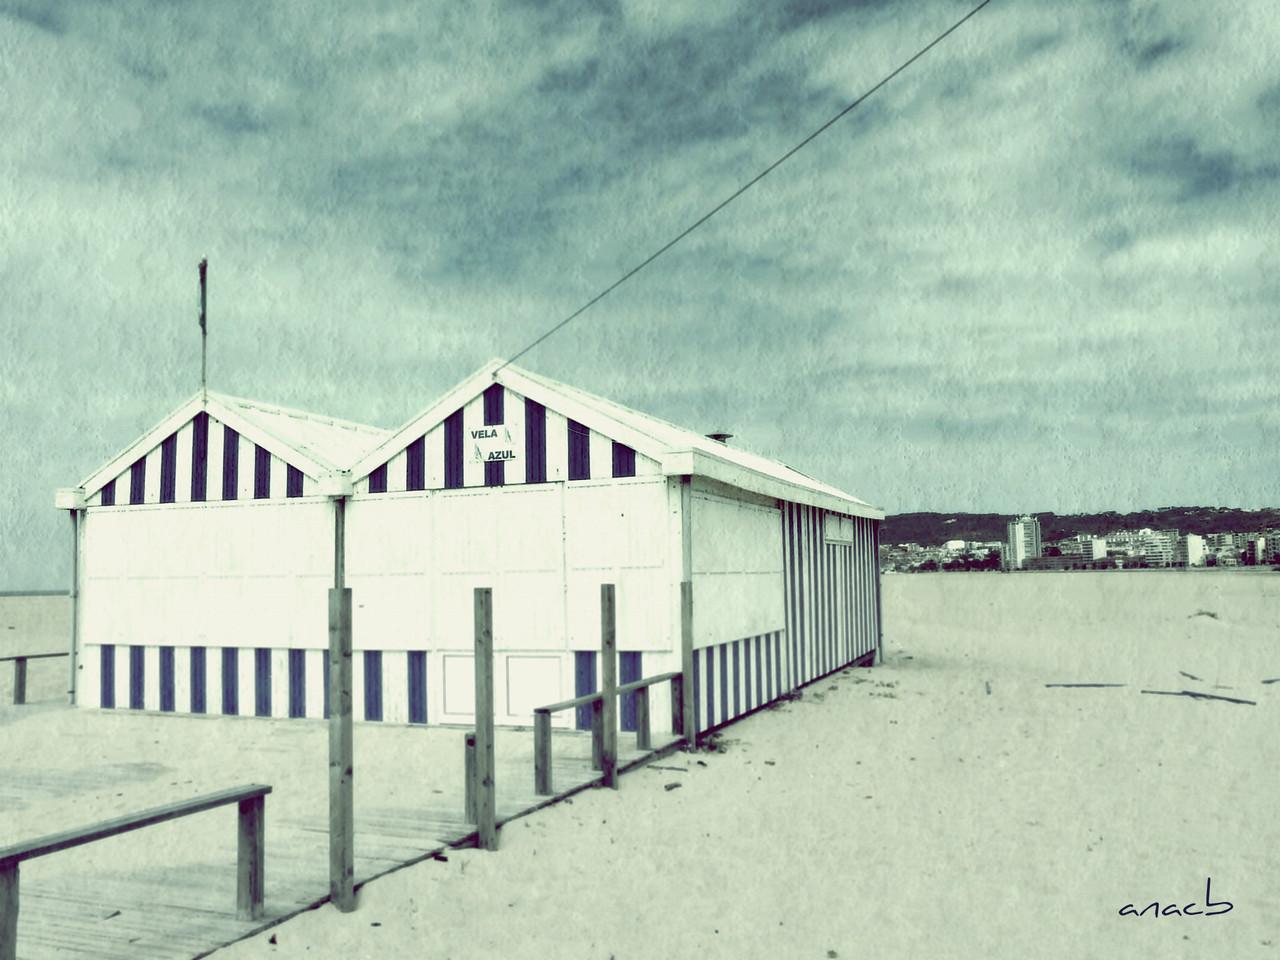 ao acaso #15 praia da Figueira da Foz.jpg